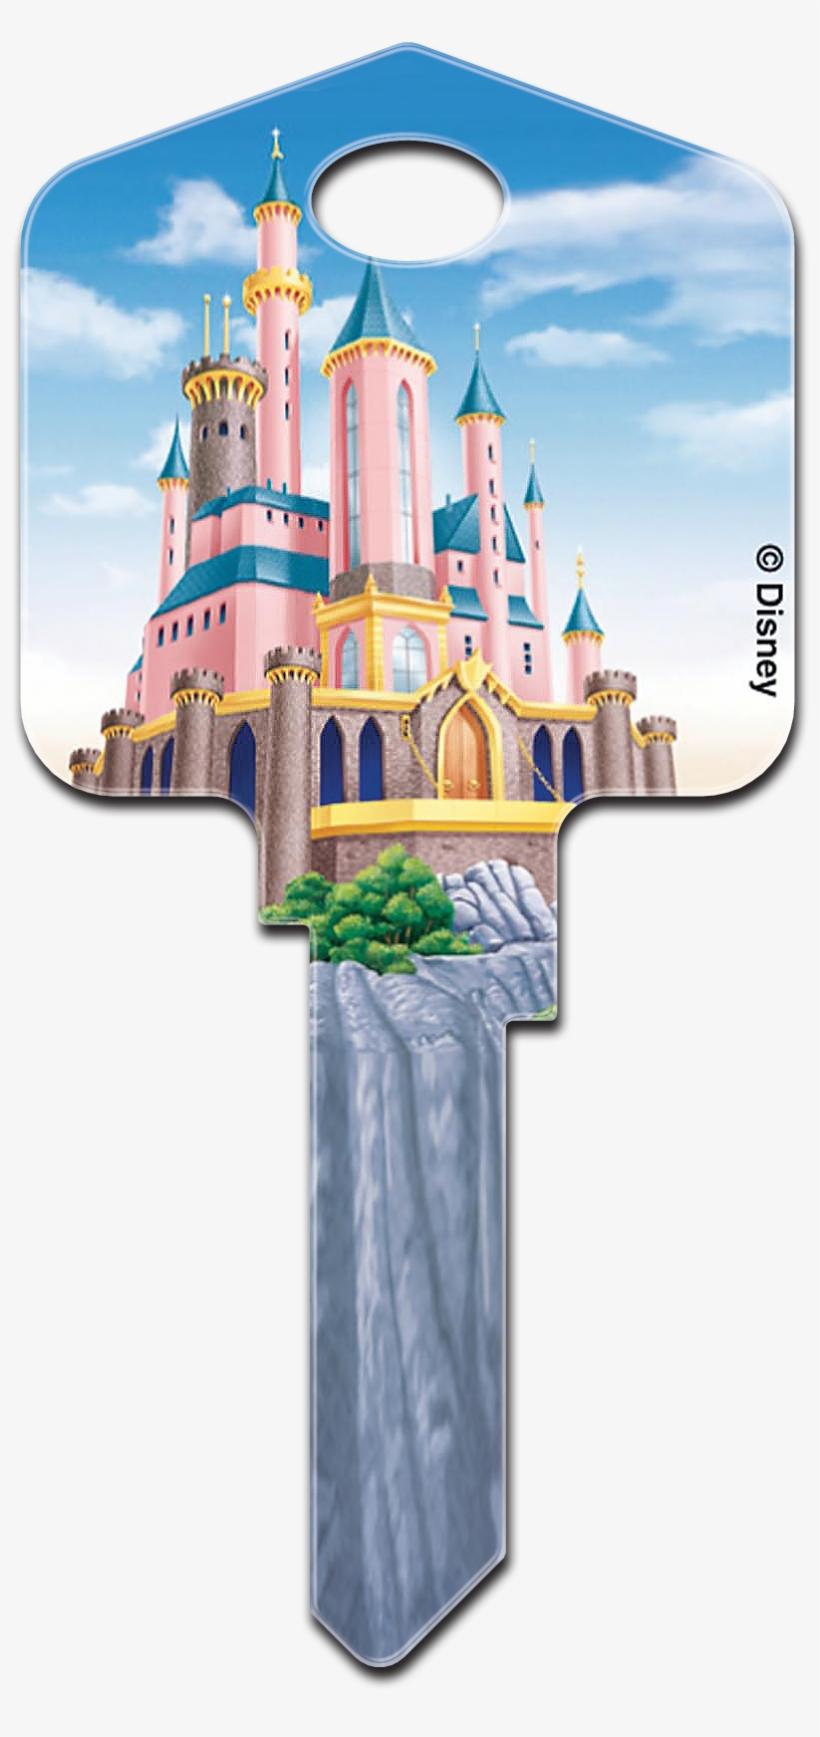 Disney Princesses - Disney Princesses Castle Lifesize Cardboard Cutout, transparent png #4869466